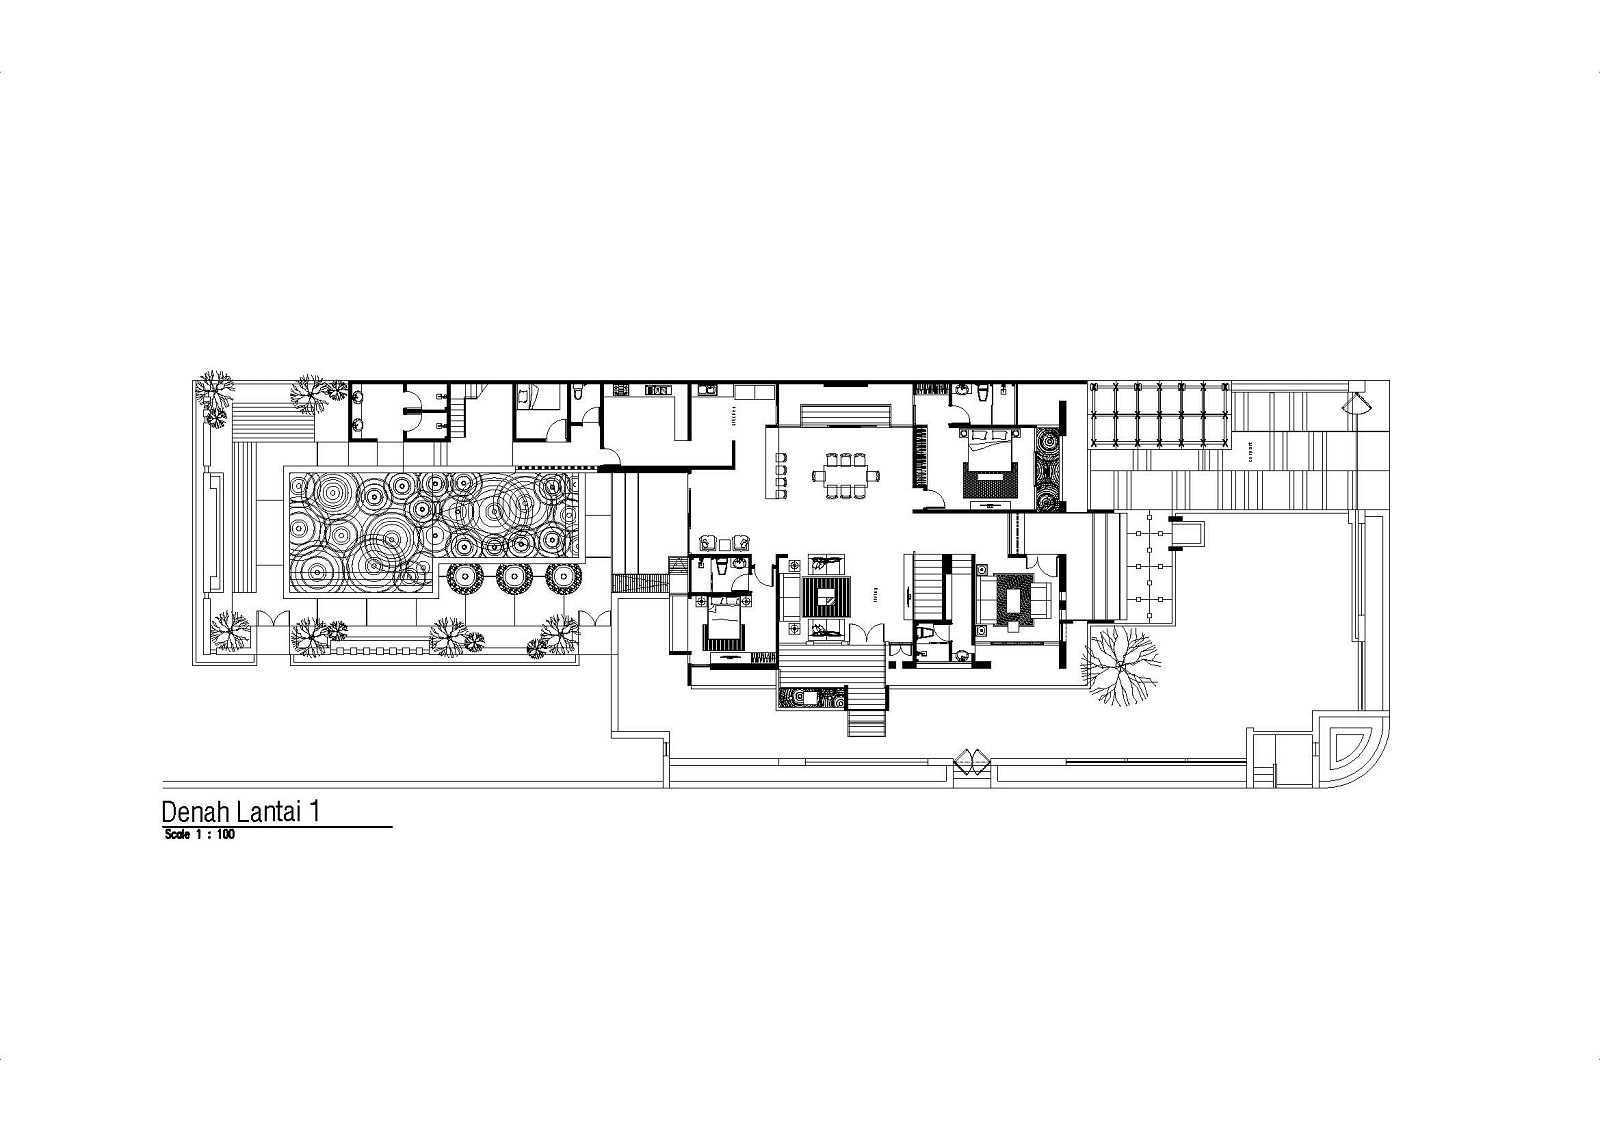 Satuvista Architect Rumah Tropis Hook Kabupaten Jombang, Jawa Timur, Indonesia Jawa Timur, Indonesia Floorplan 1St Floor Tropical  48707